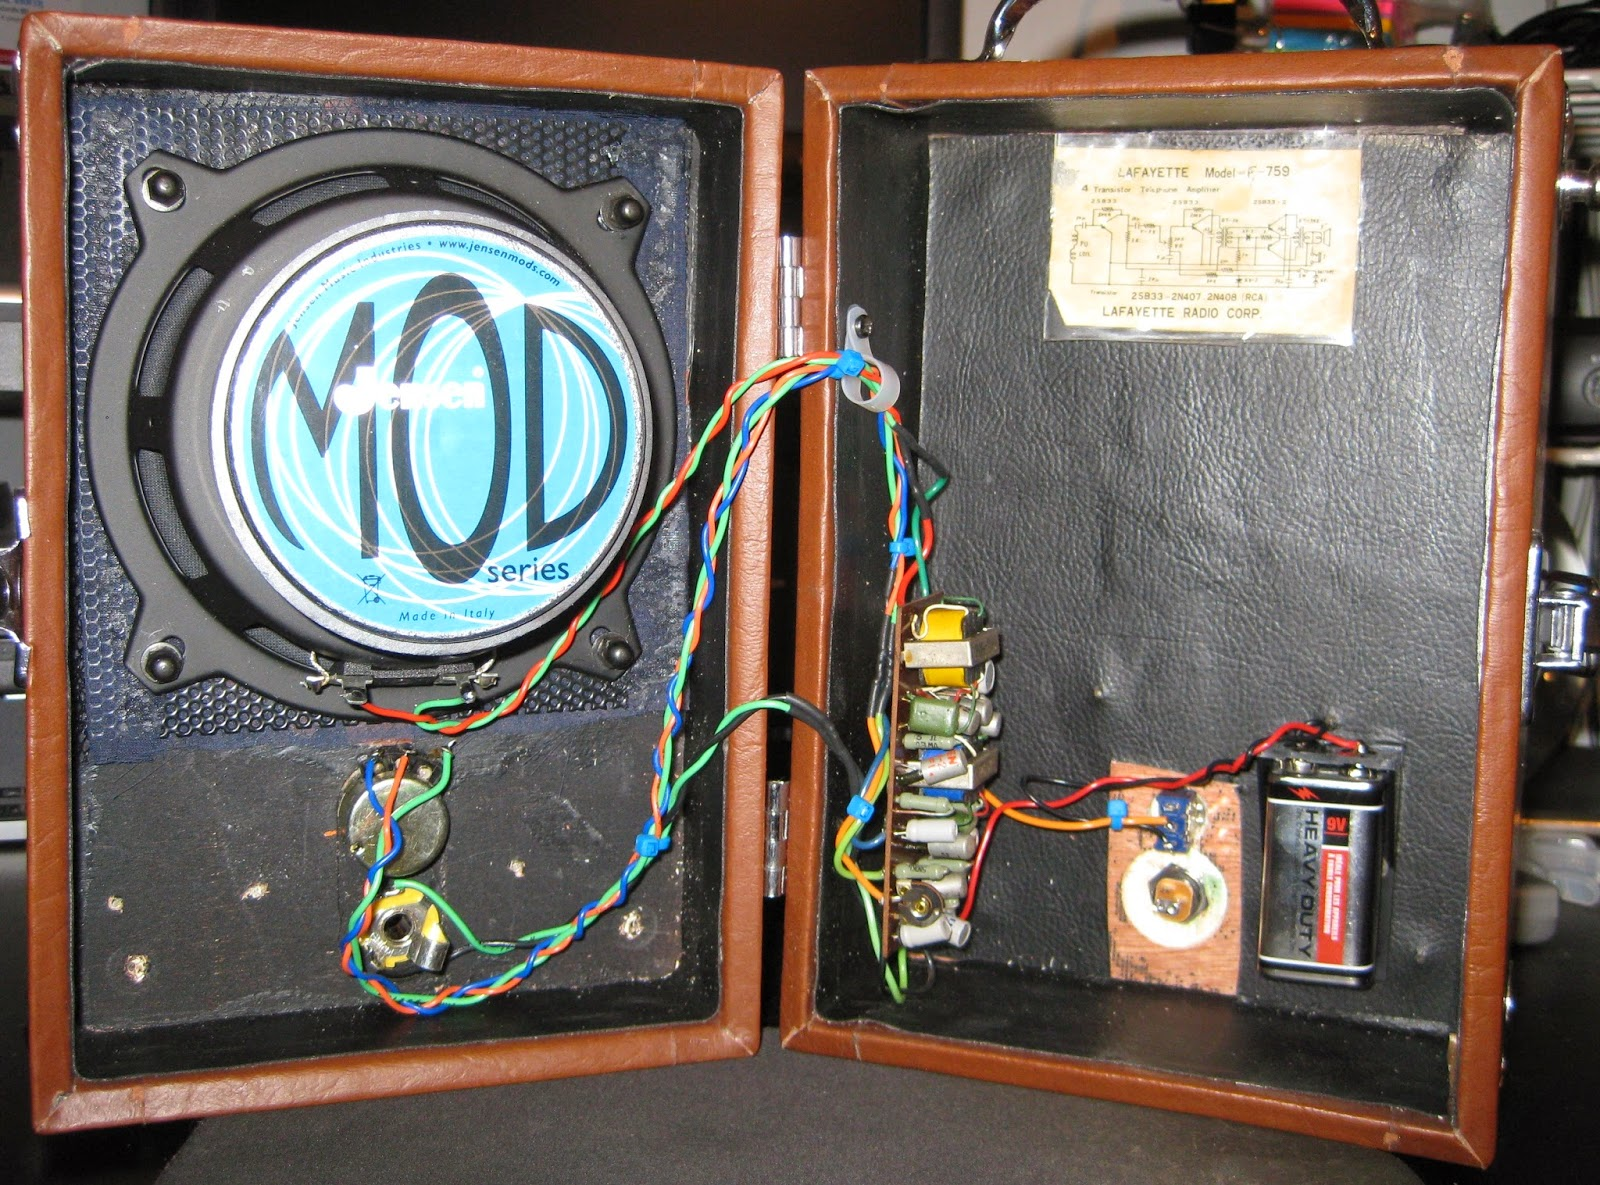 Diy Guitar Amp Hacks June 2014 Pignose Strat Wiring Diagram A Note For Me Dudeclips Please